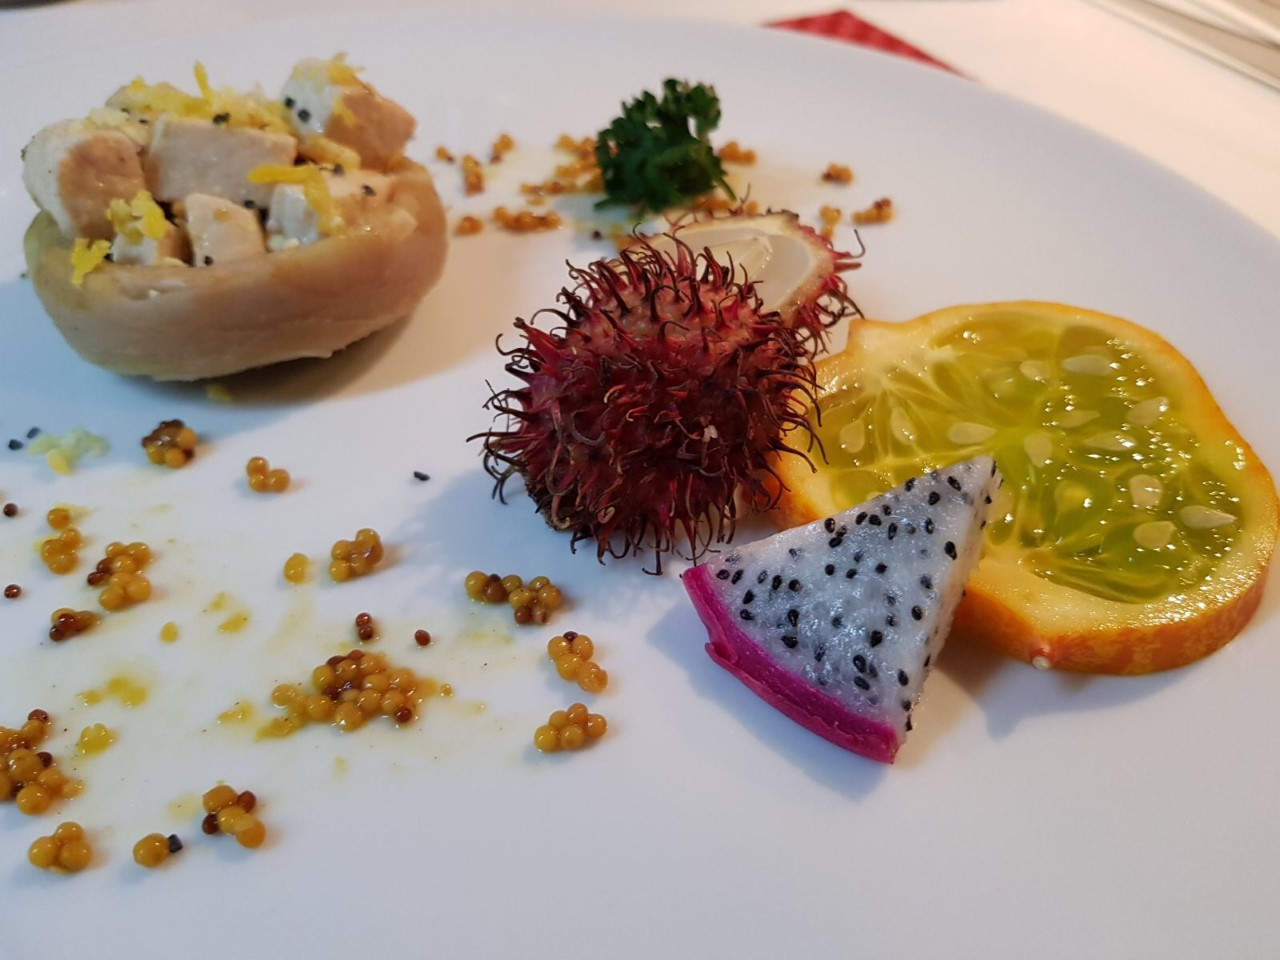 carciofi con spada limone e senape 4